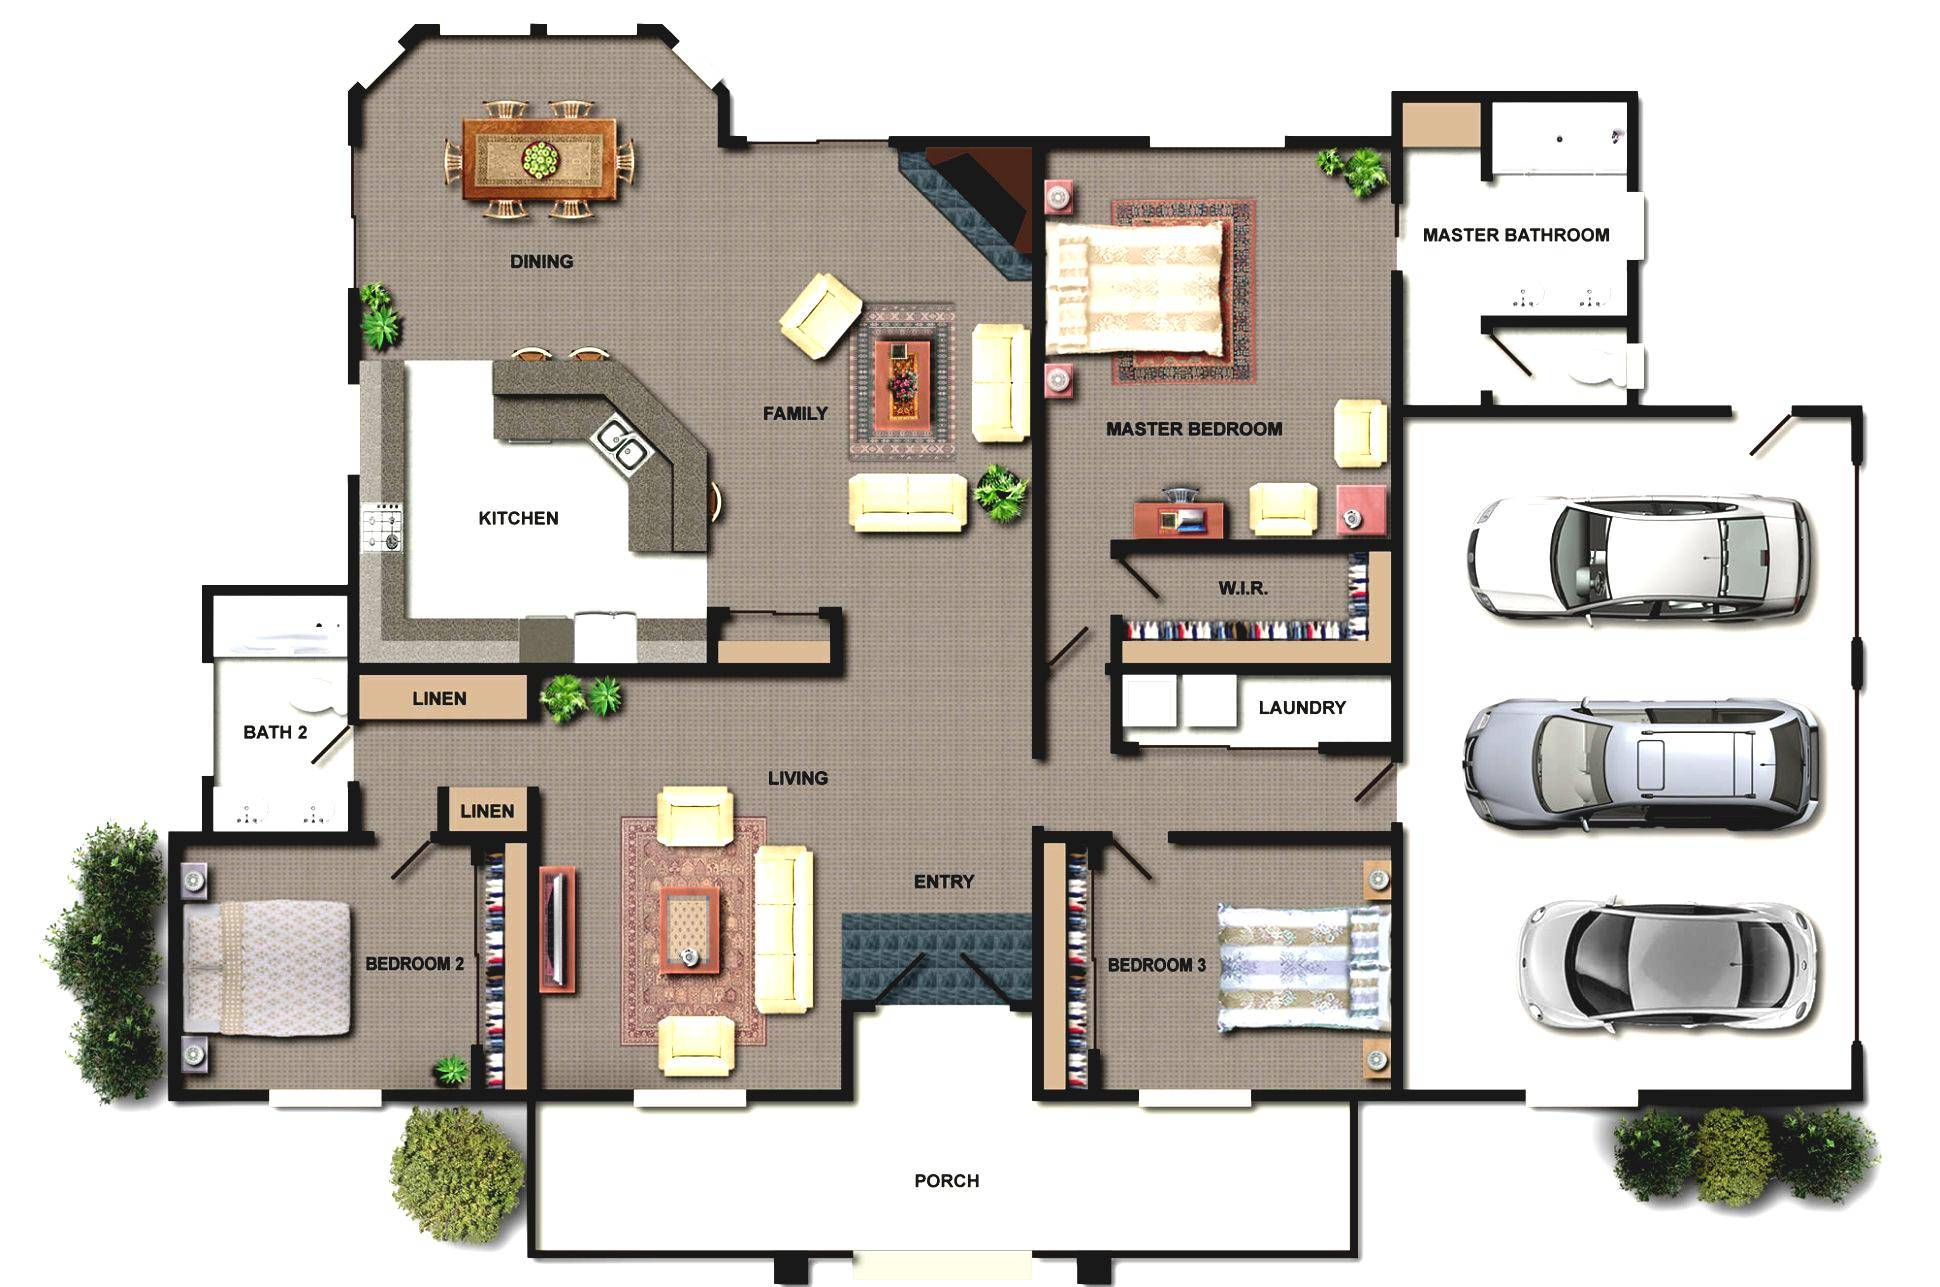 Architecture Designs Pdf Design Ideas Best Idea Exterior - House